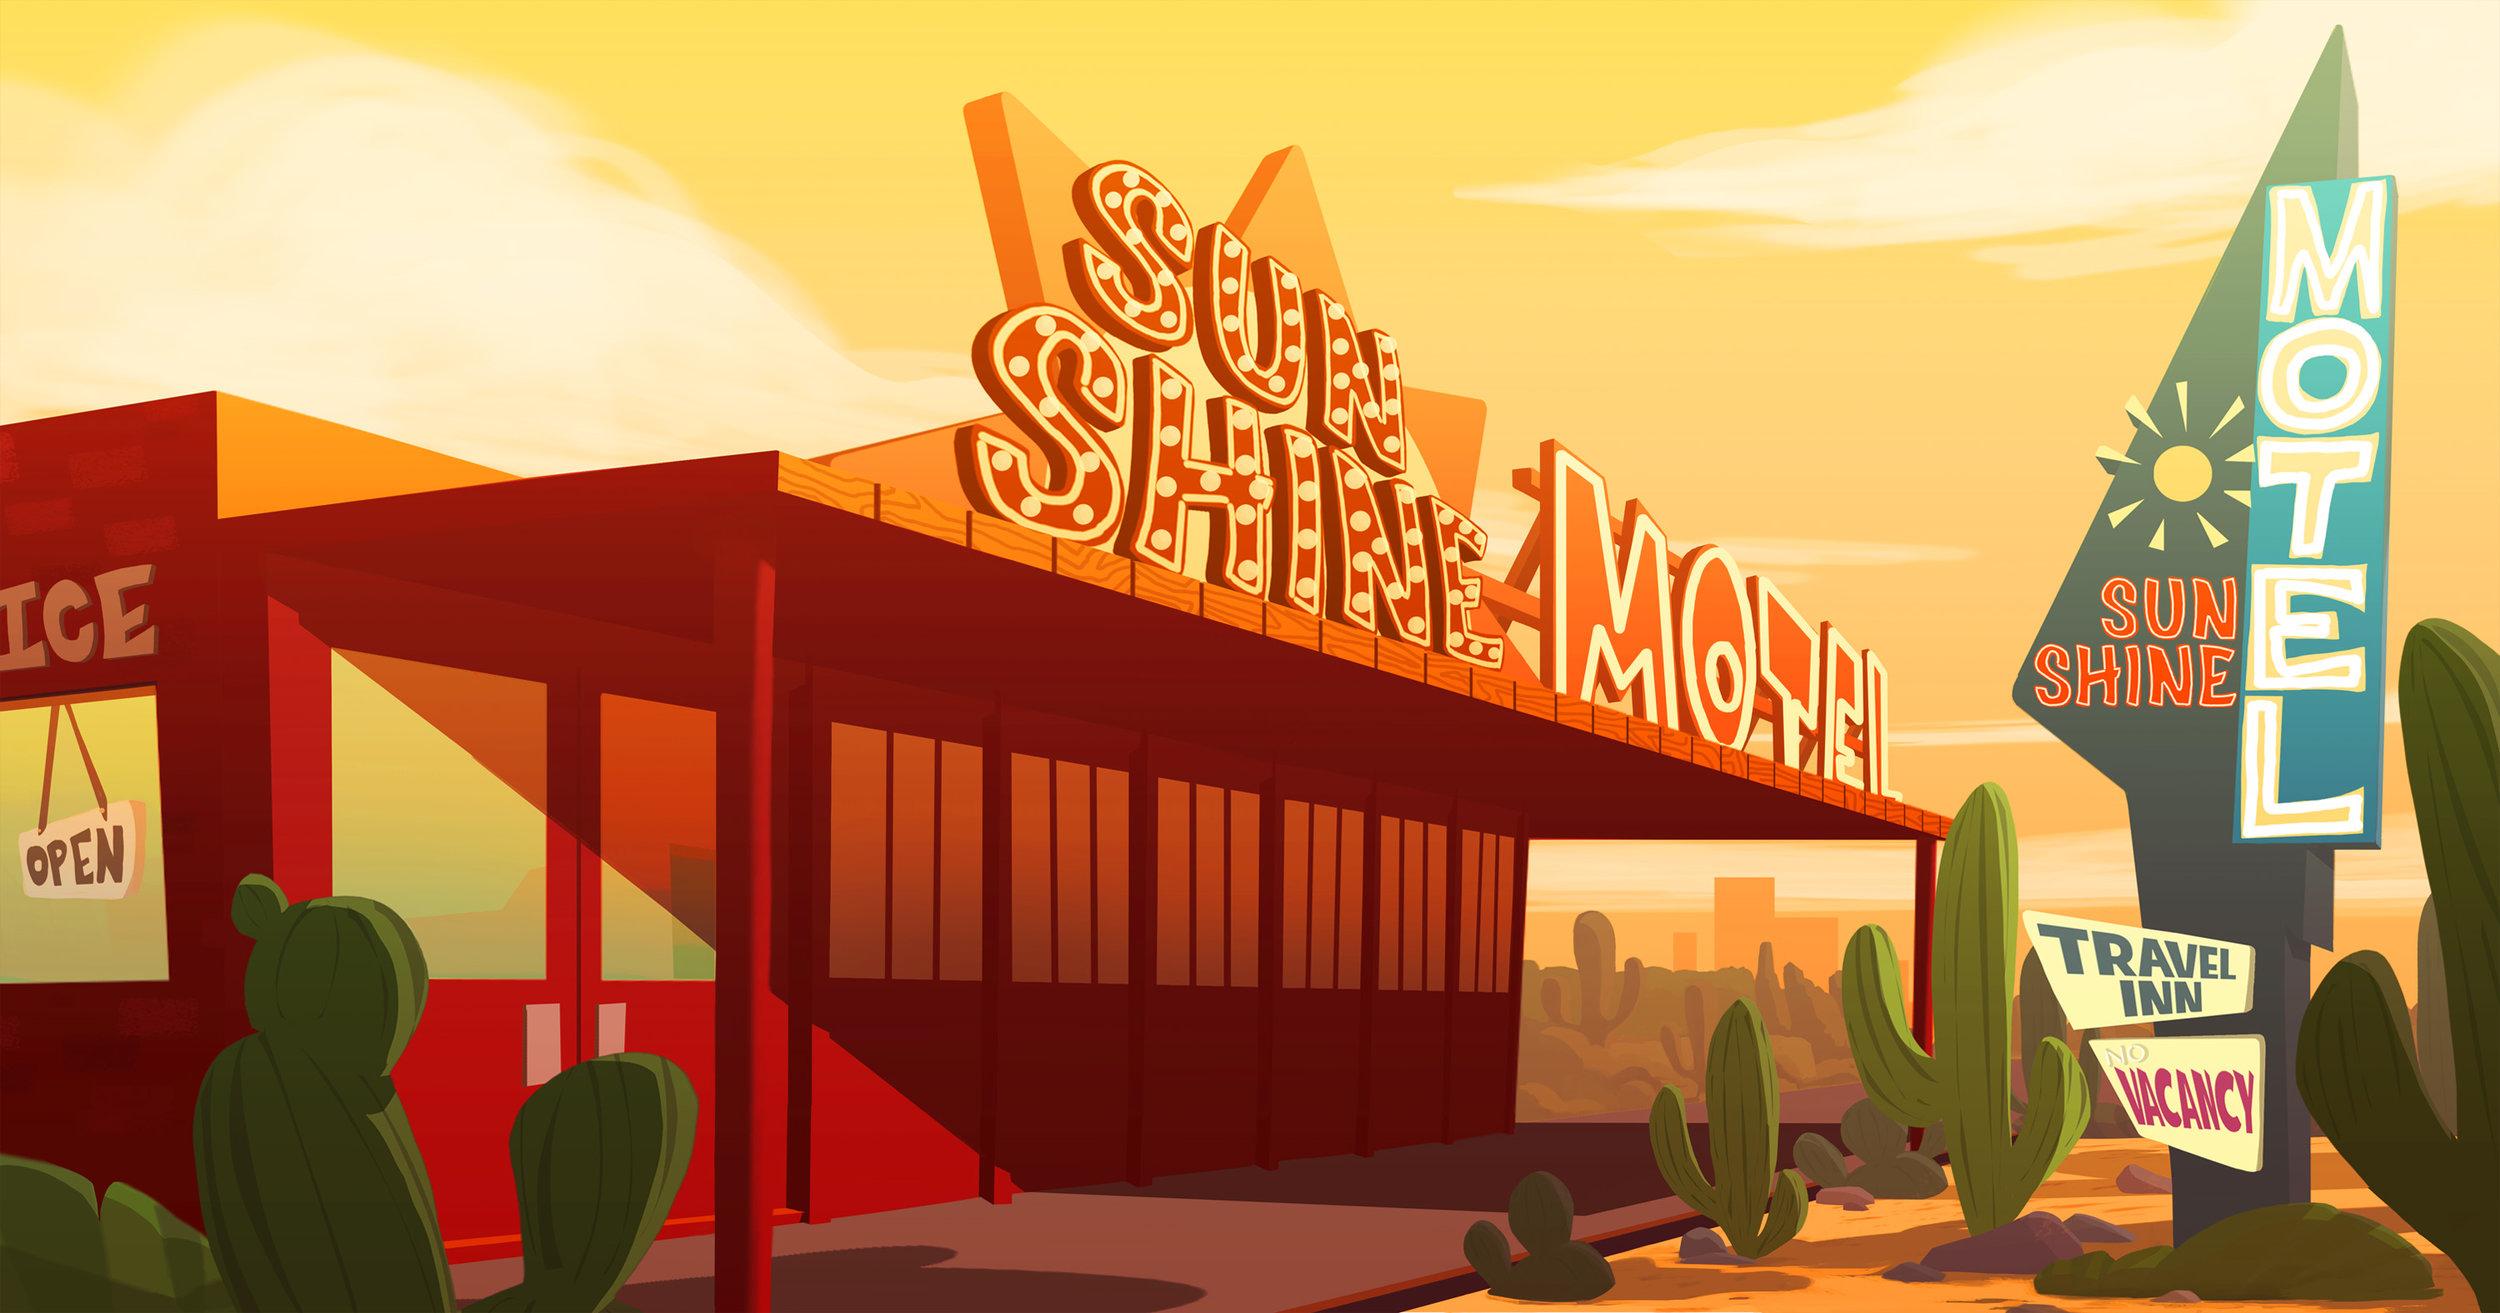 Vegas Theme - Sun Shine Motel